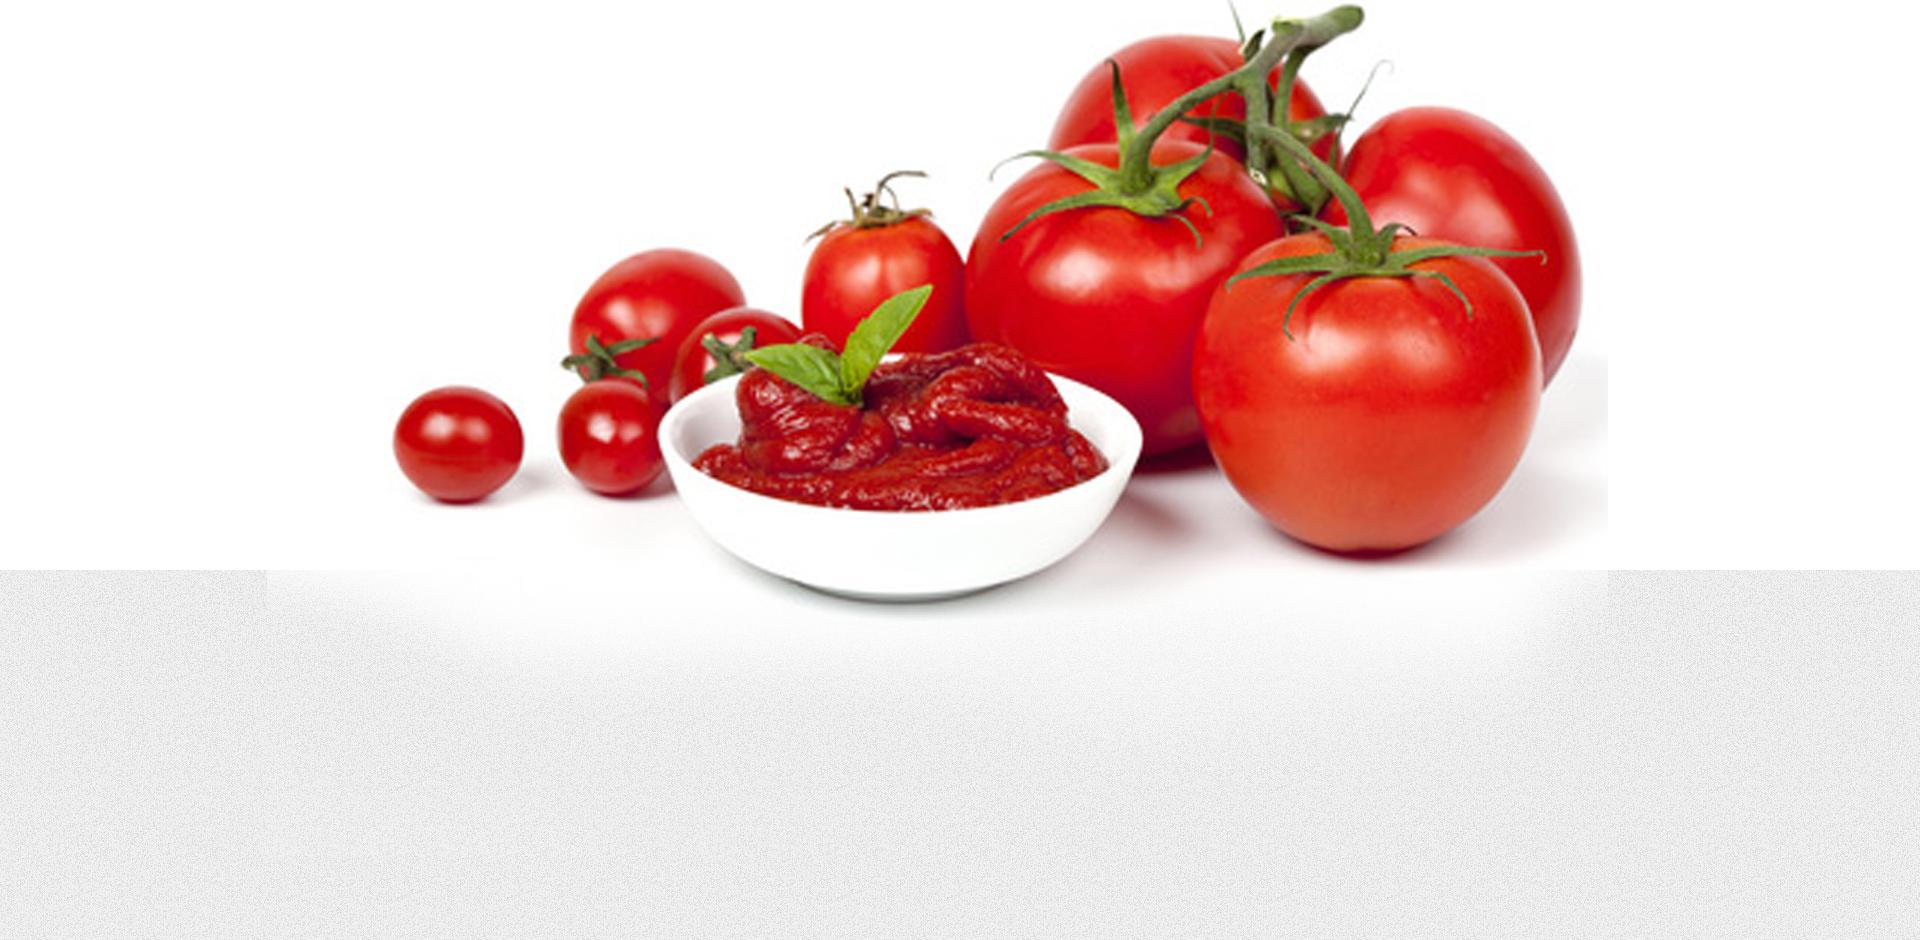 PNG Tomato Sauce - 57061